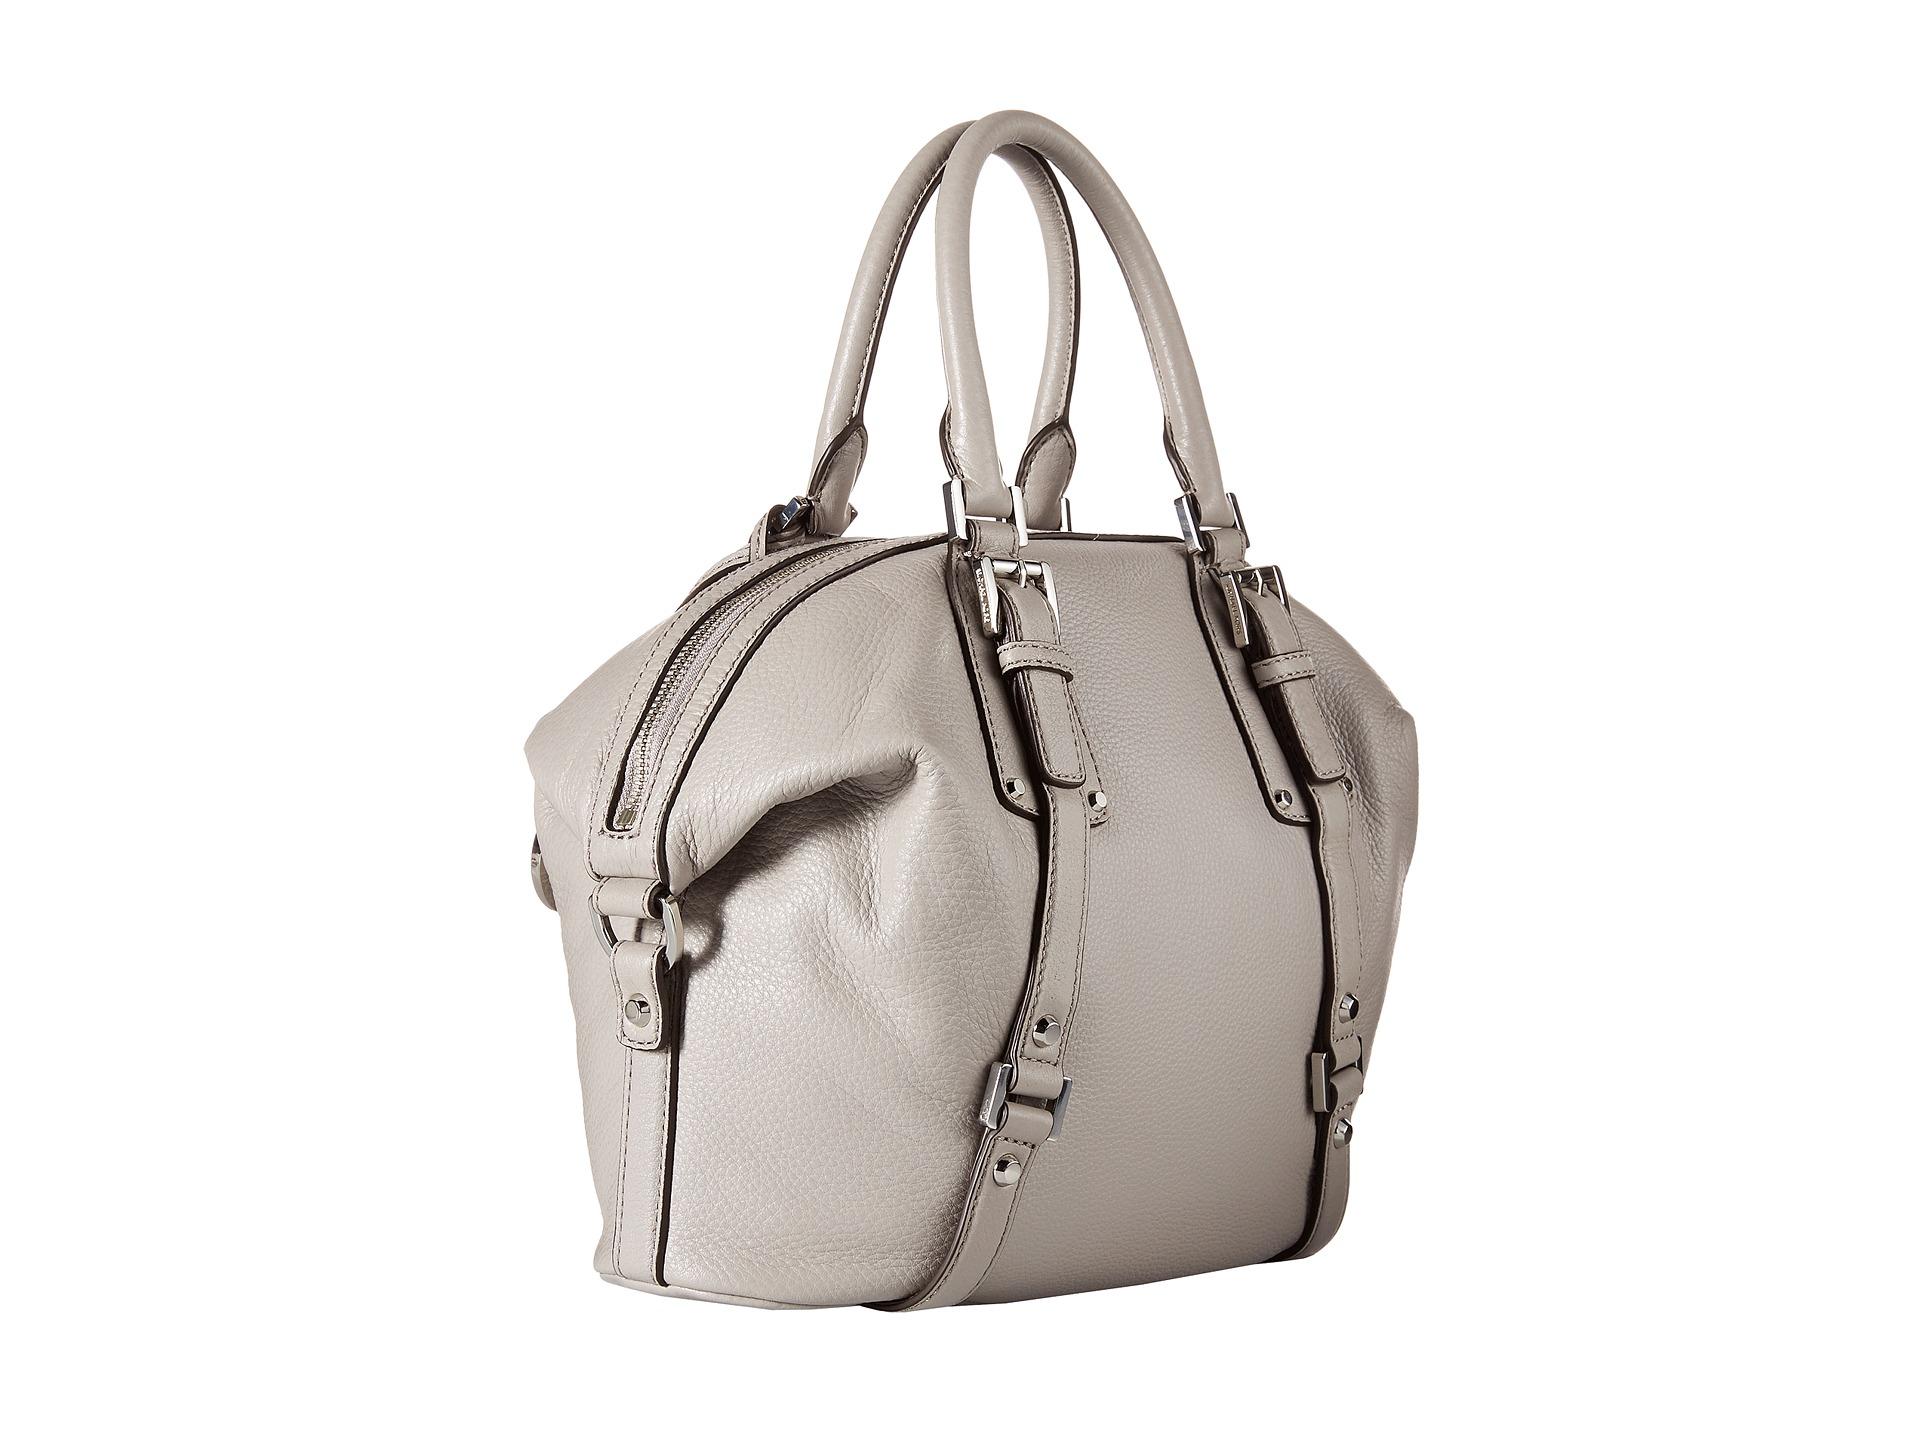 e93885f756e9 ... order lyst michael michael kors bedford belted medium satchel in gray  47da3 028fd